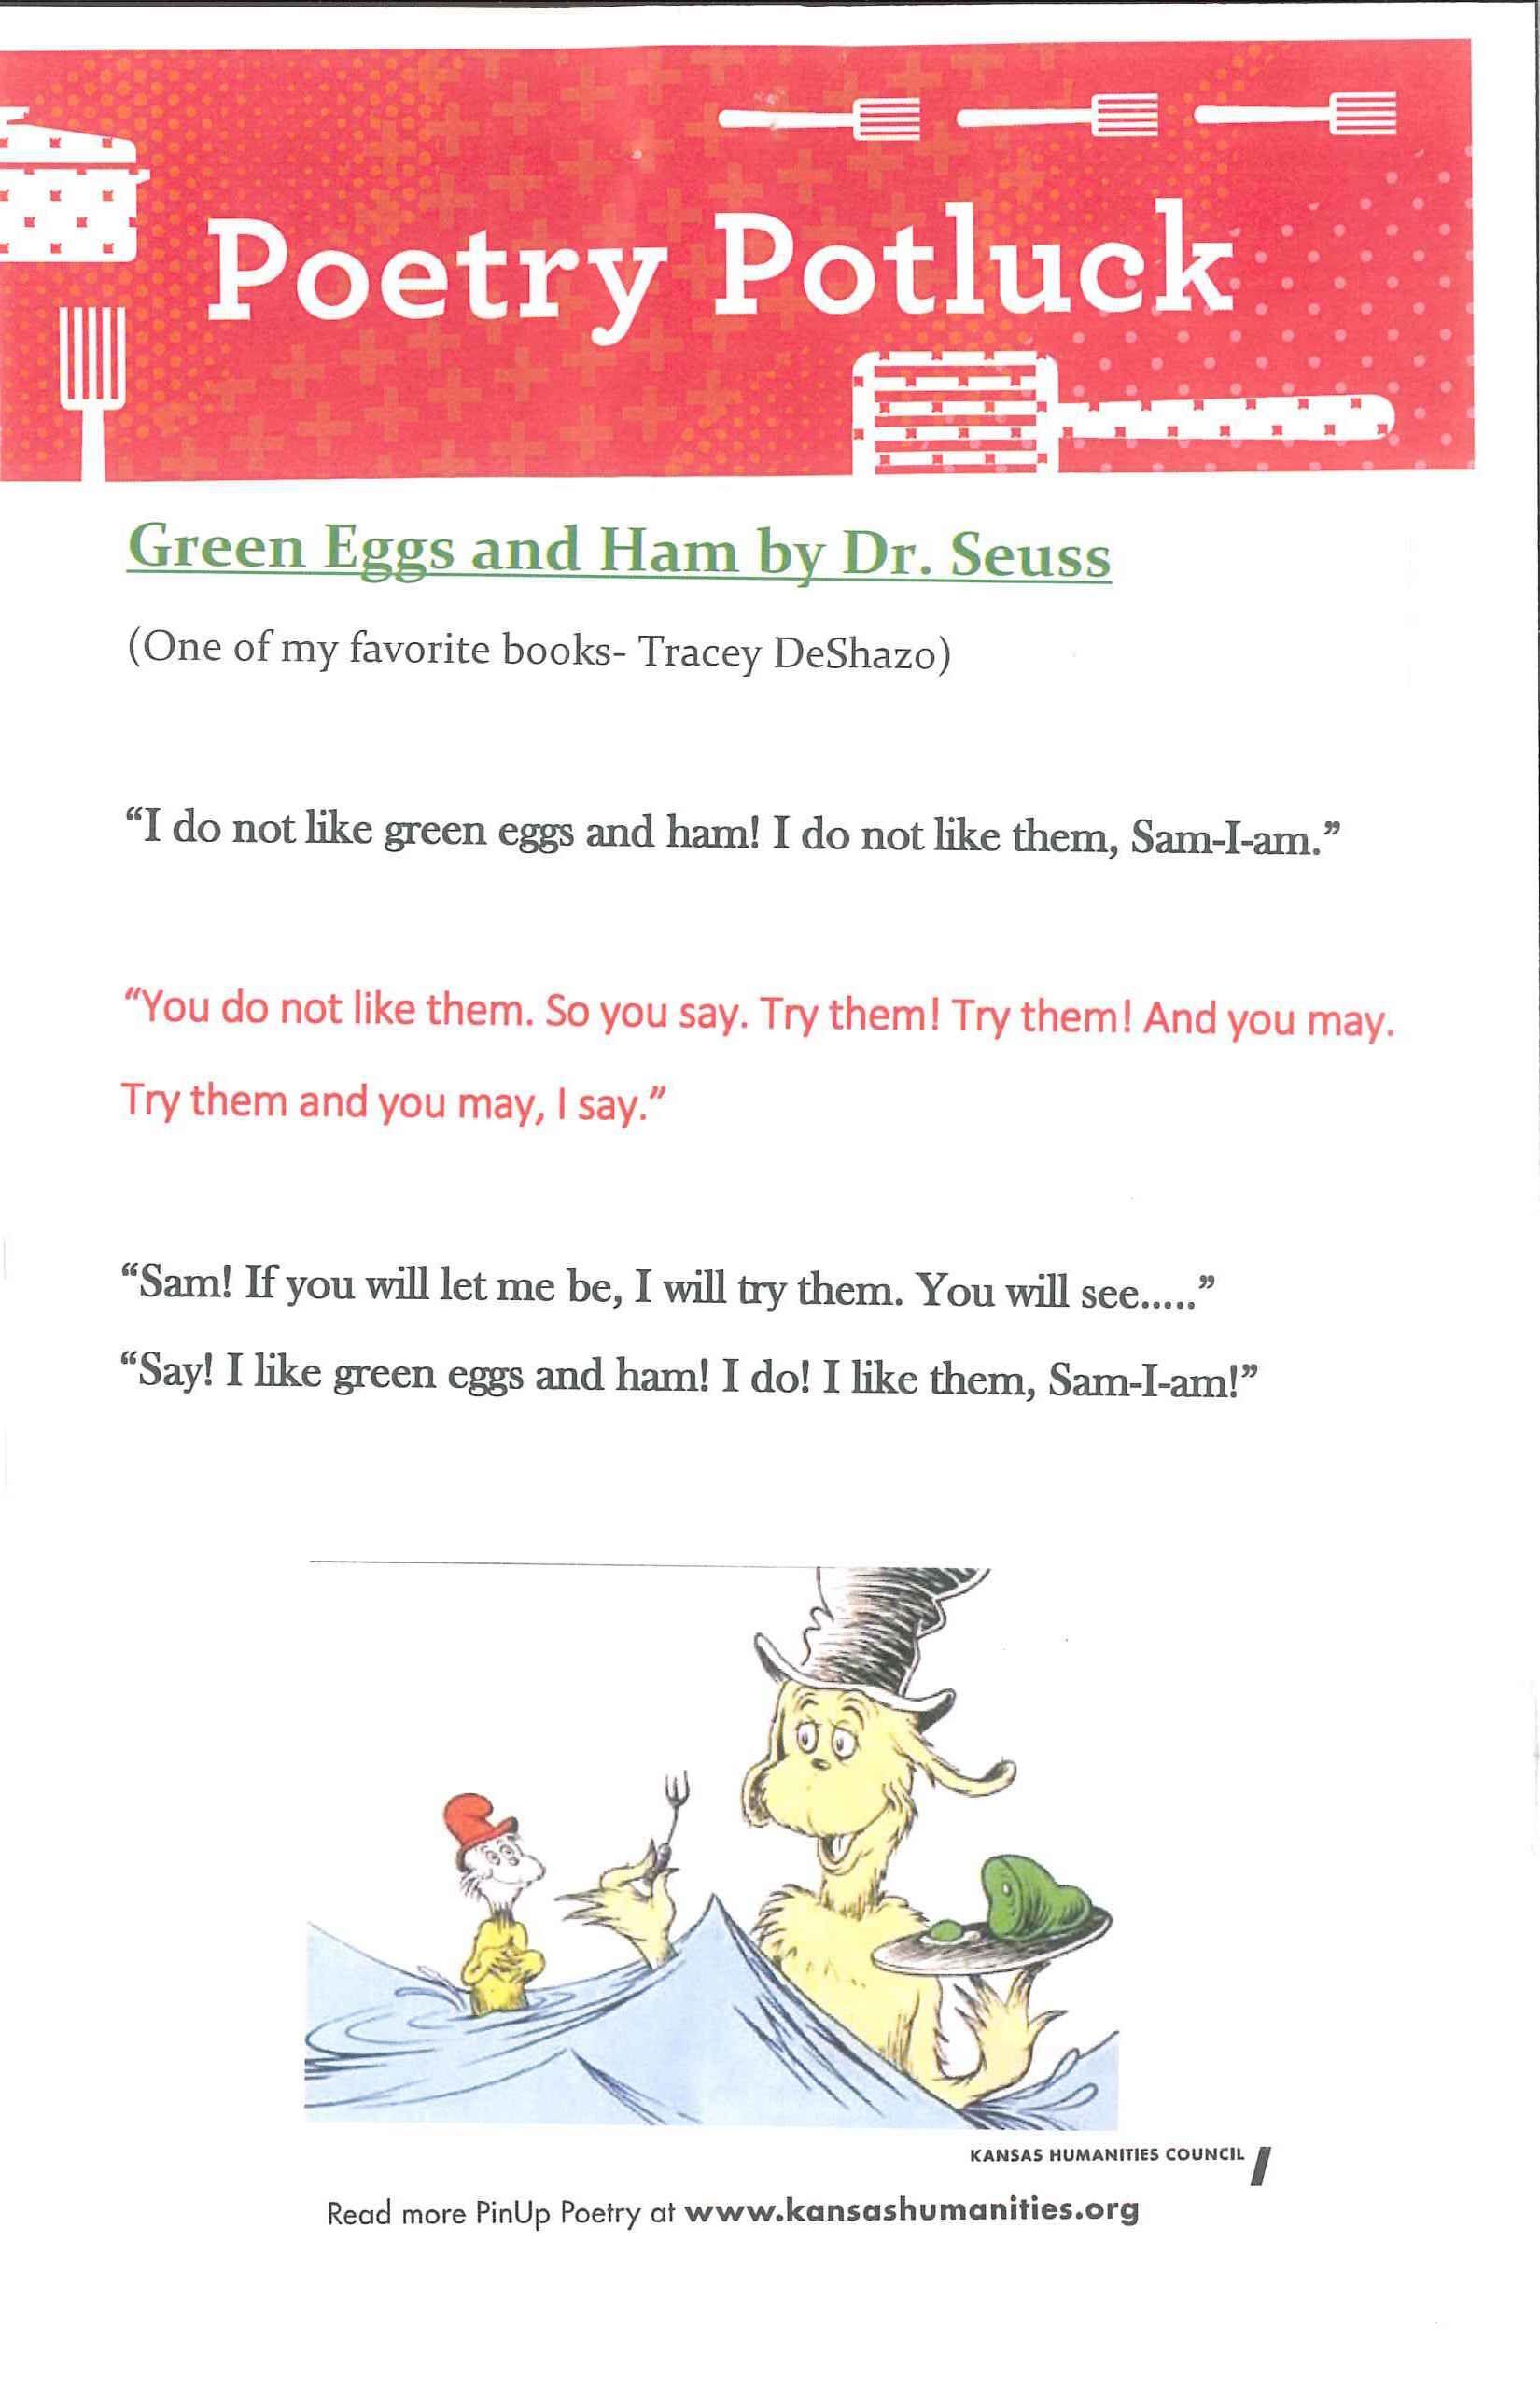 dr seuss green eggs and ham book lyrics